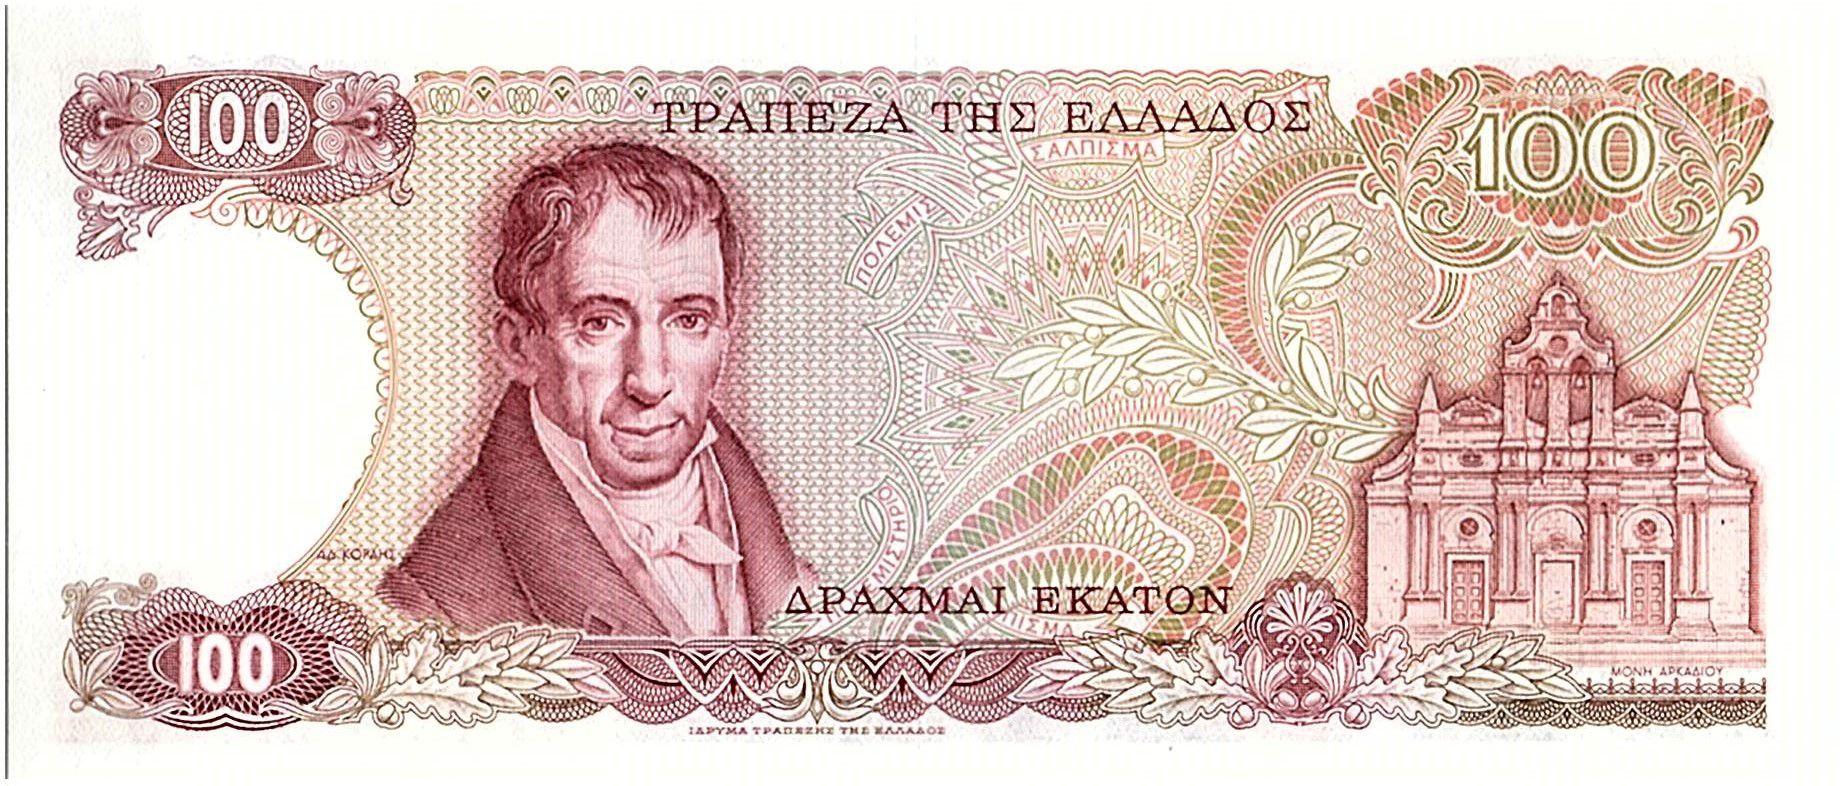 Grèce 100 Drachms - Athéna Peiraios - A. Koréas - Eglise - 1978